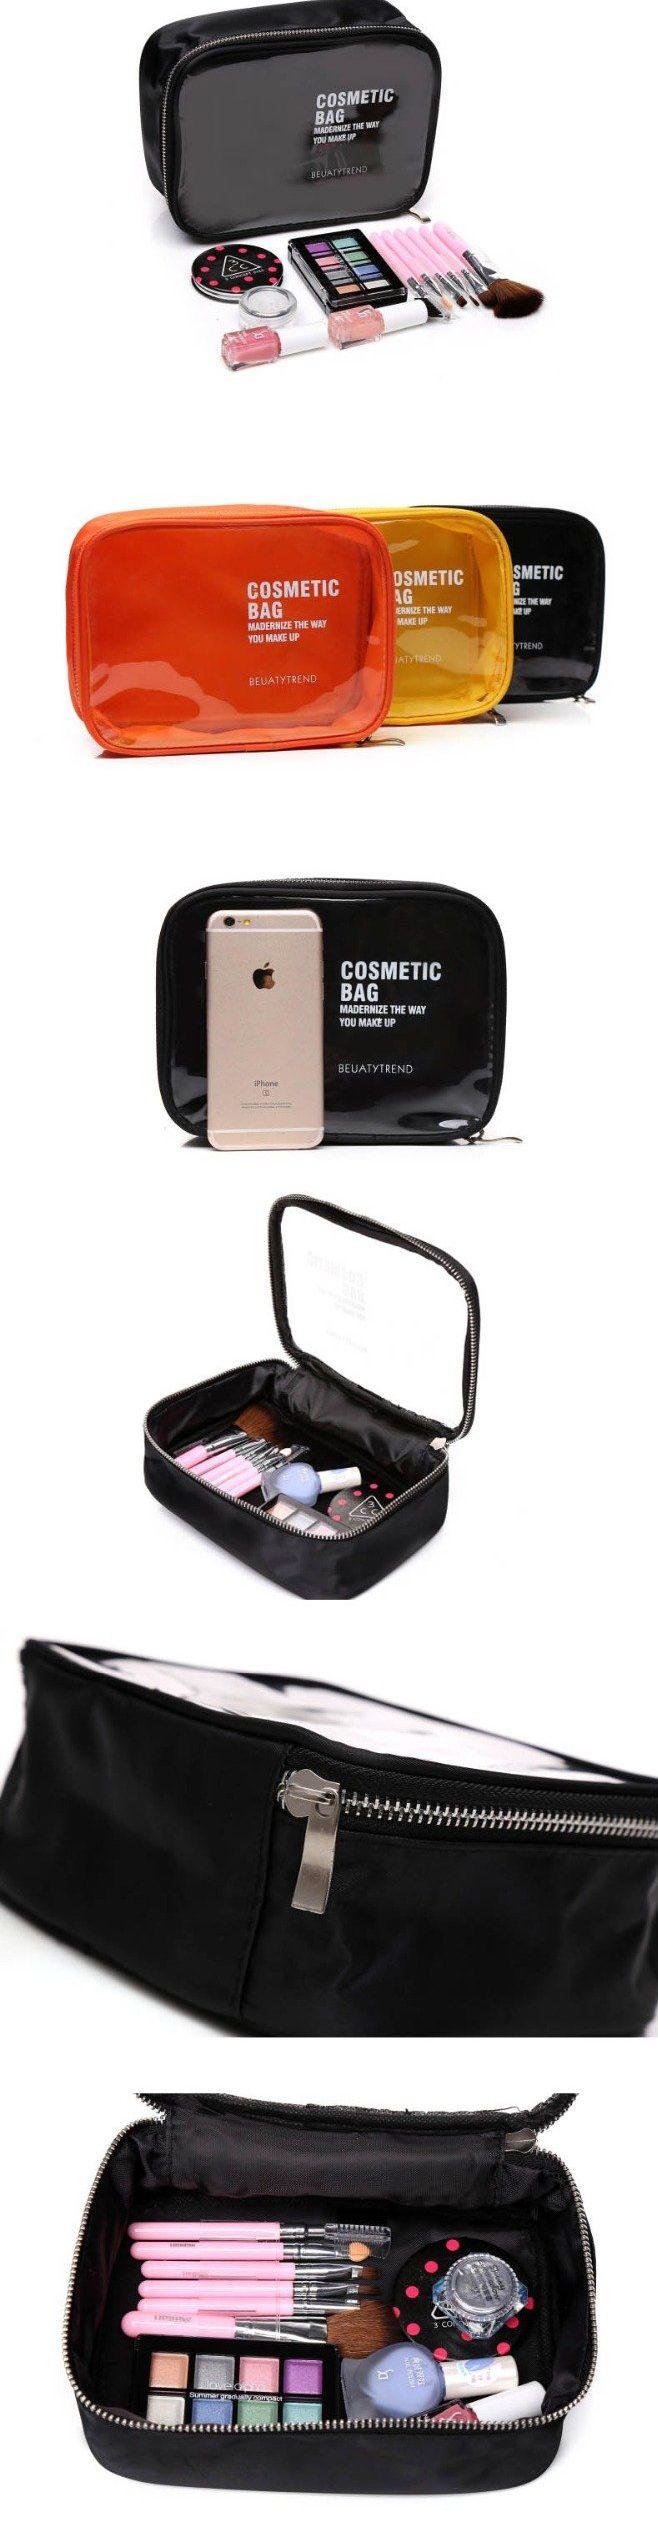 Bolsa de cosmética